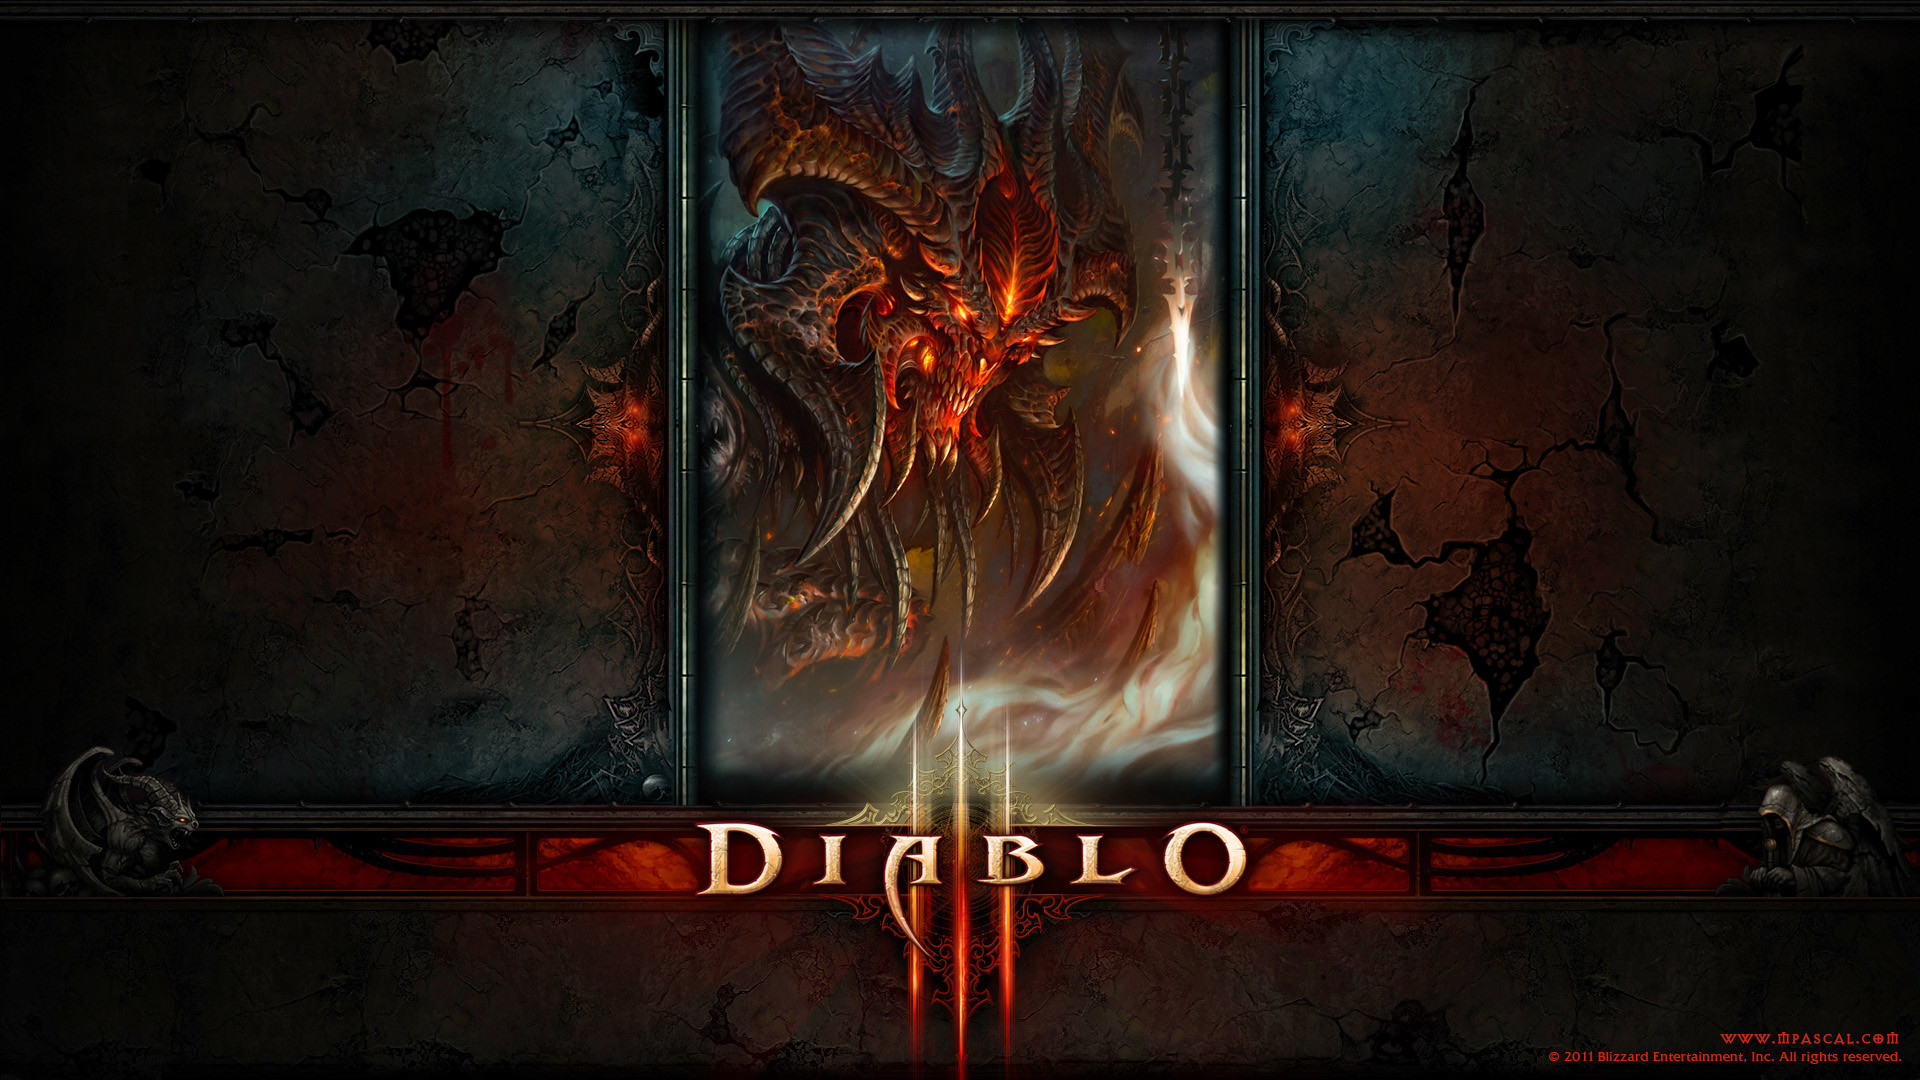 Diablo III  № 1896346 бесплатно